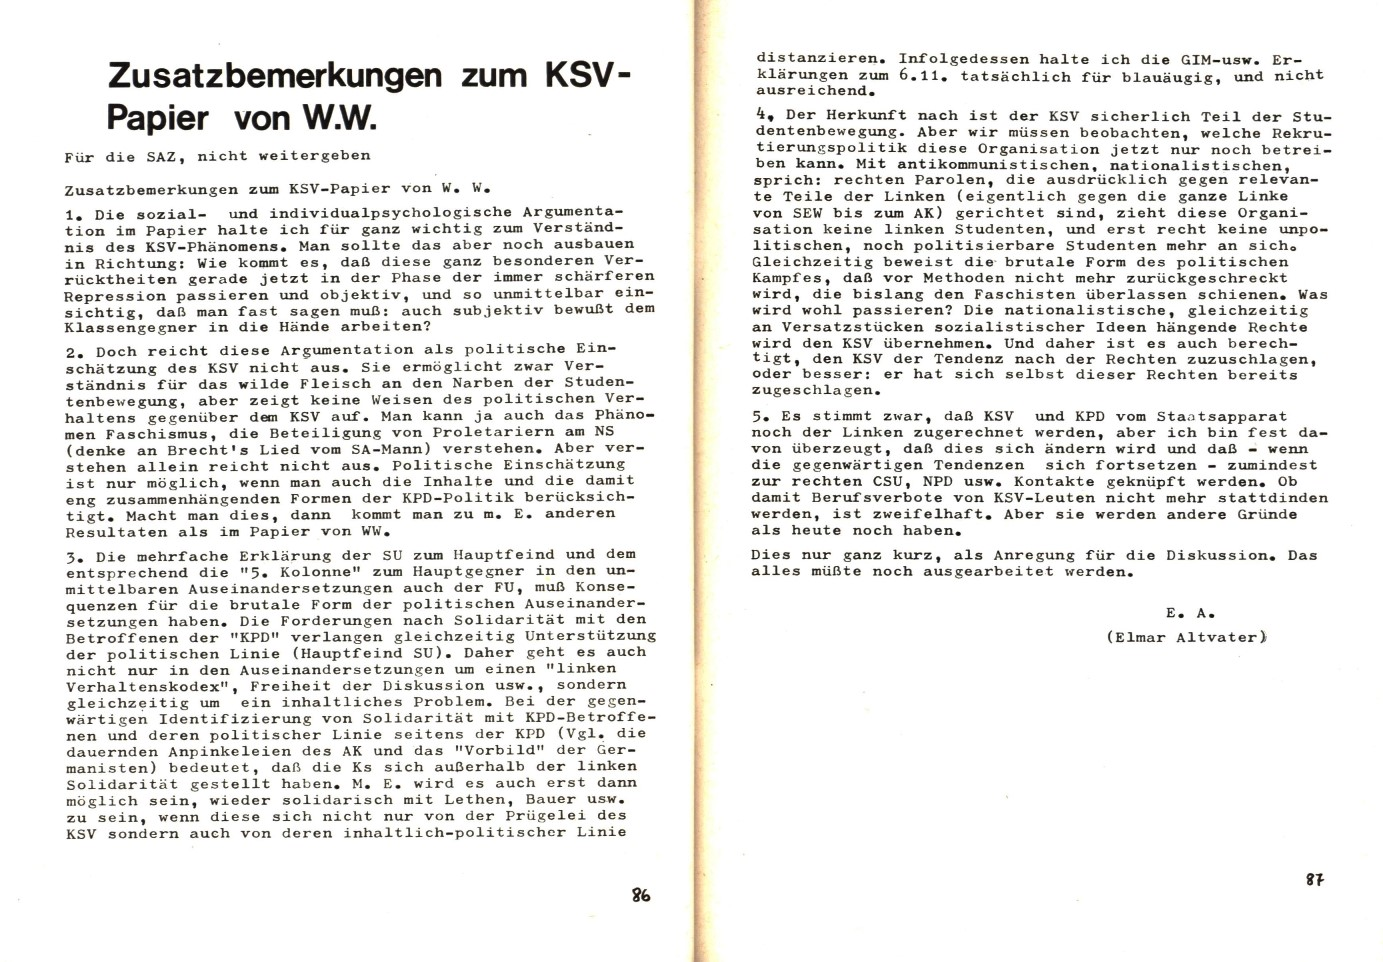 Berlin_KSV_1975_Dokumente_der_SAZ_45